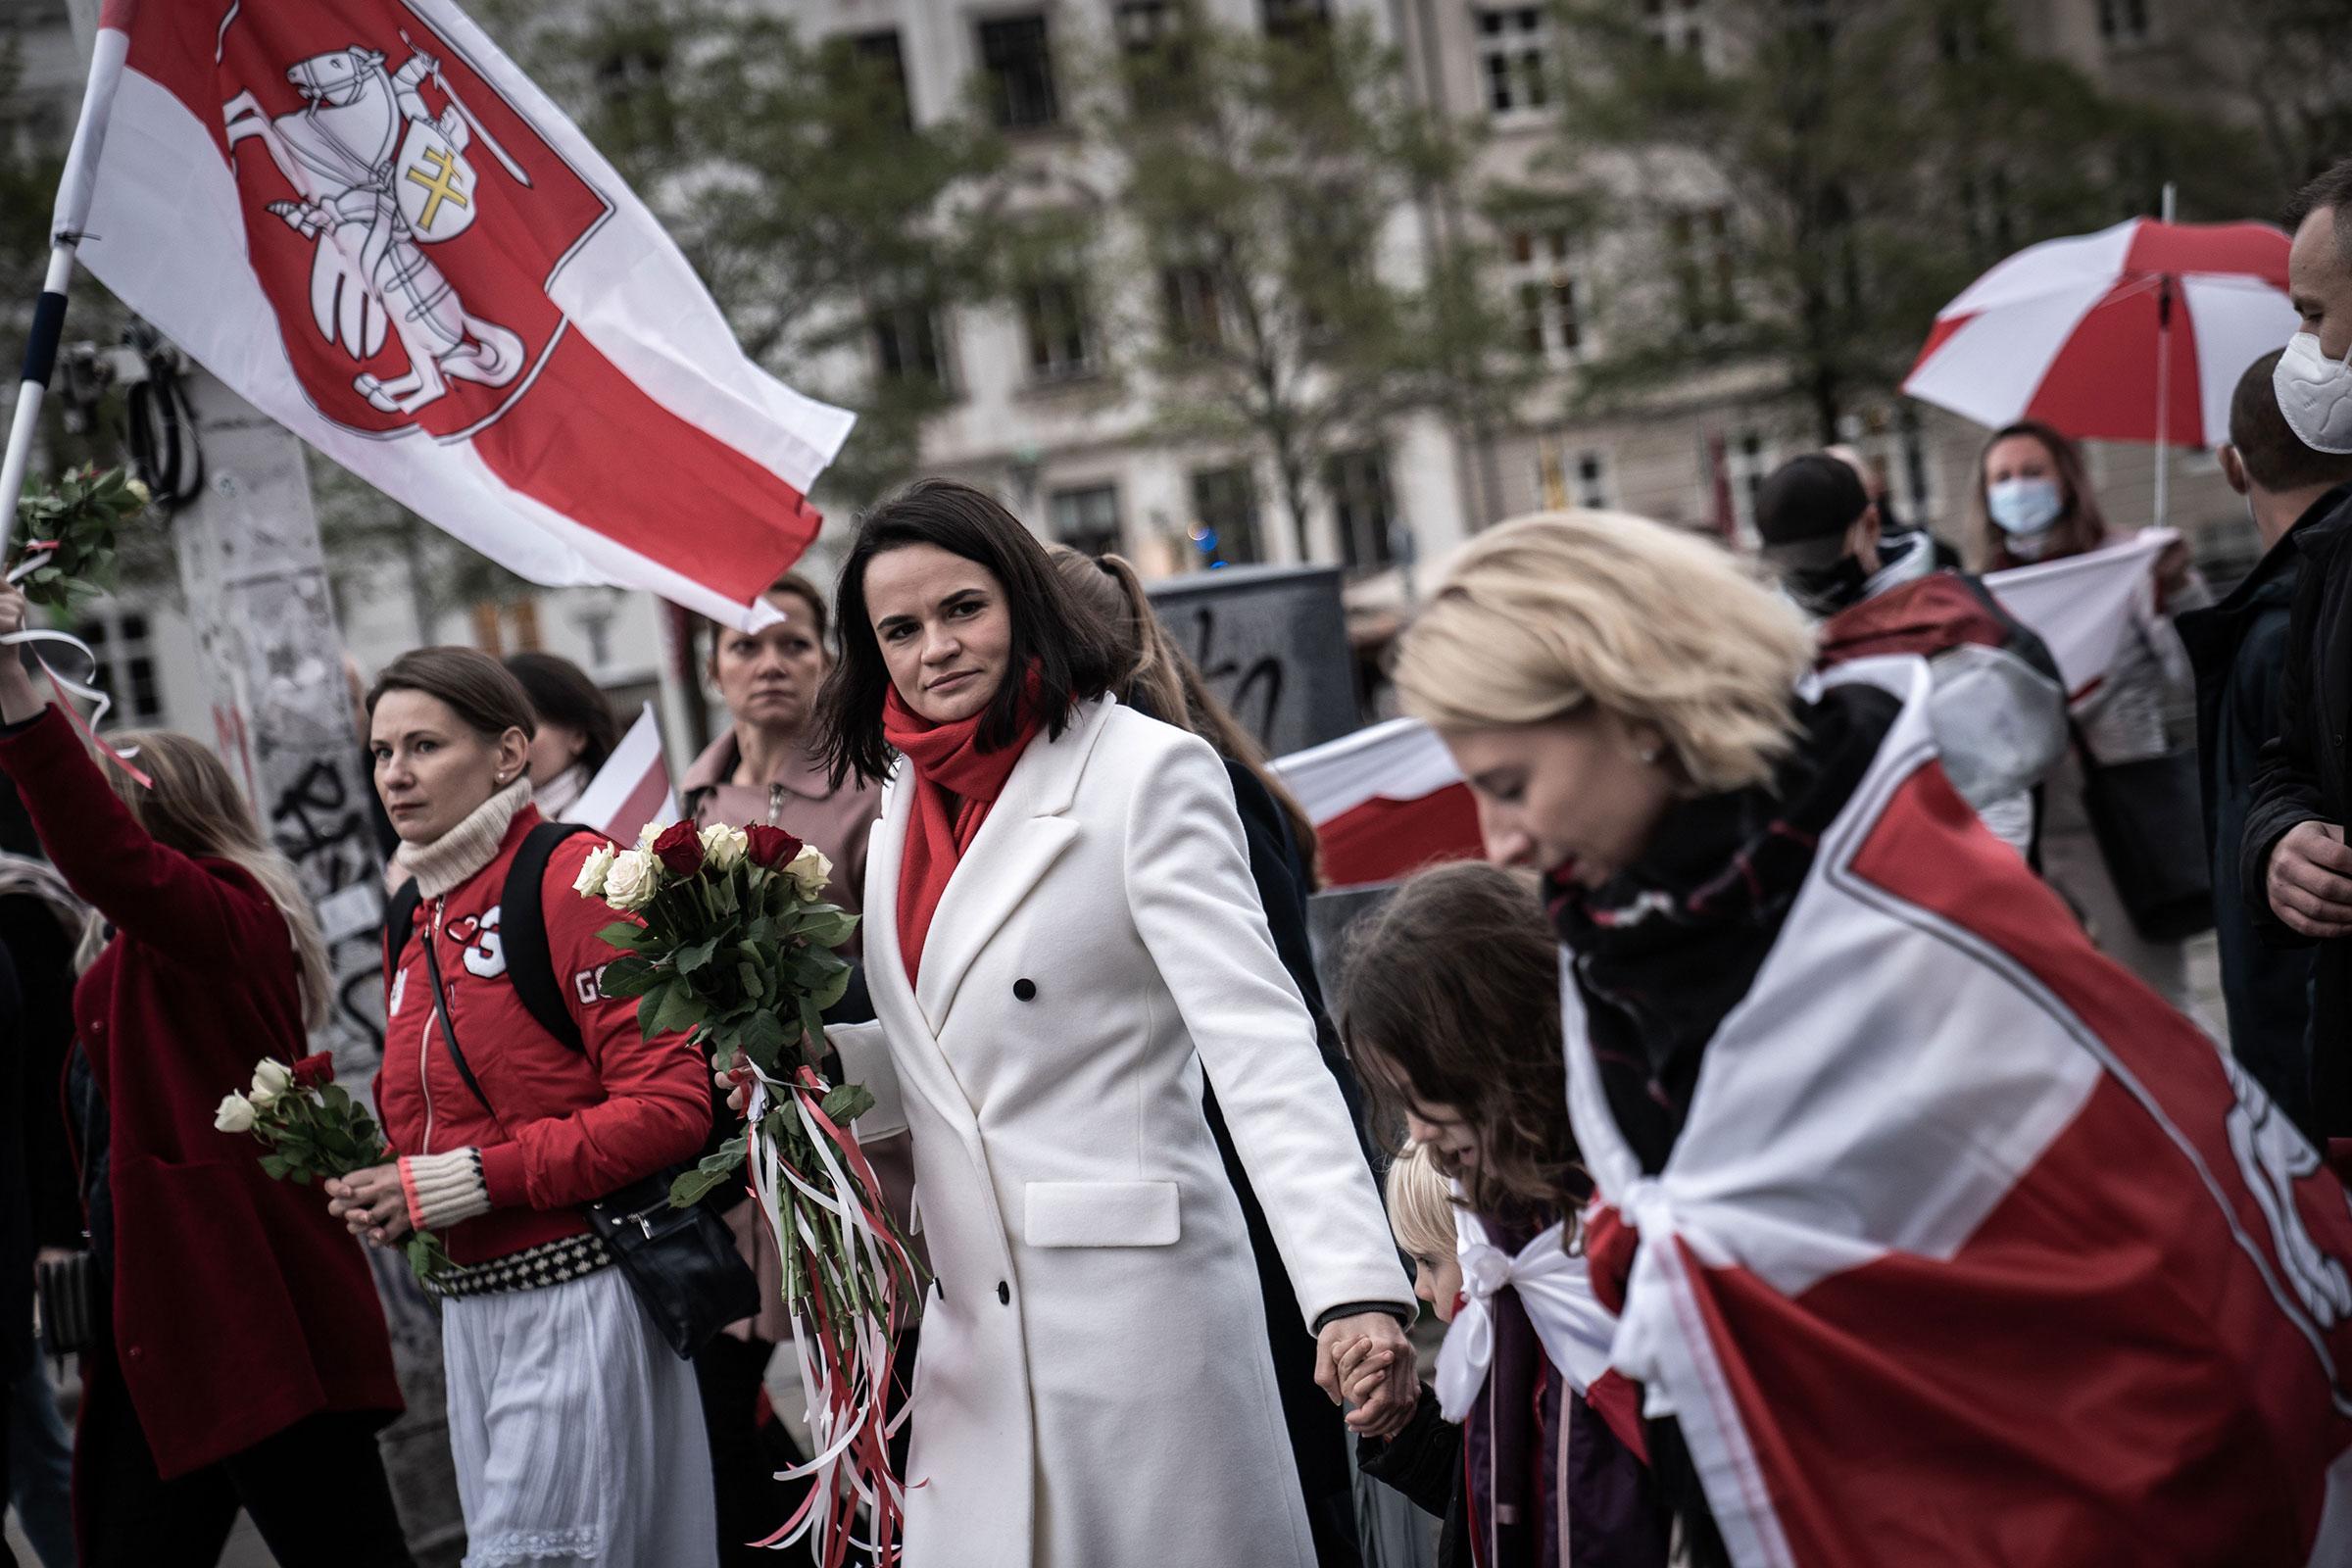 Belarusian opposition politician Svetlana Tikhanovskaya participates in a march organized by the organization Friends of Belarus Denmark on Oct. 23, 2020 in Copenhagen.